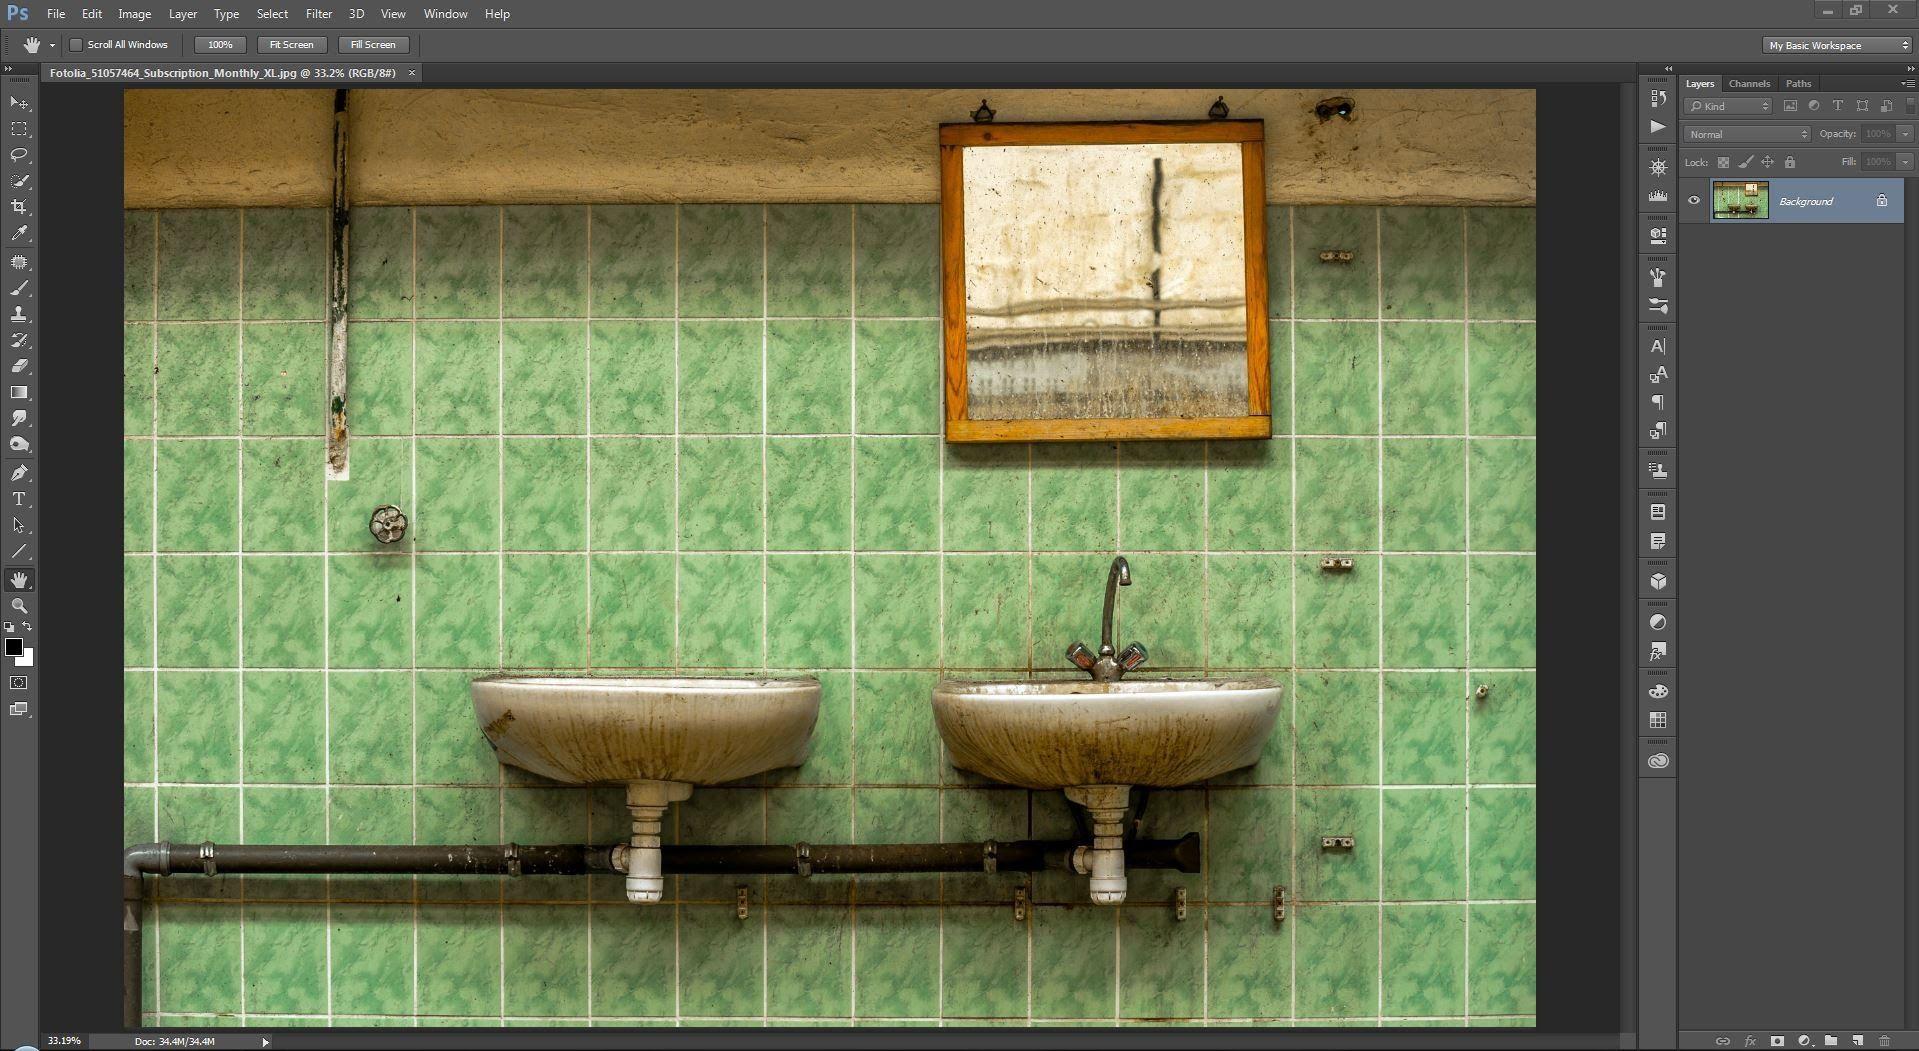 Photoshop cs6 cc 2015 content aware move tool tutorial photoshop cs6 cc 2015 content aware move tool tutorial baditri Image collections